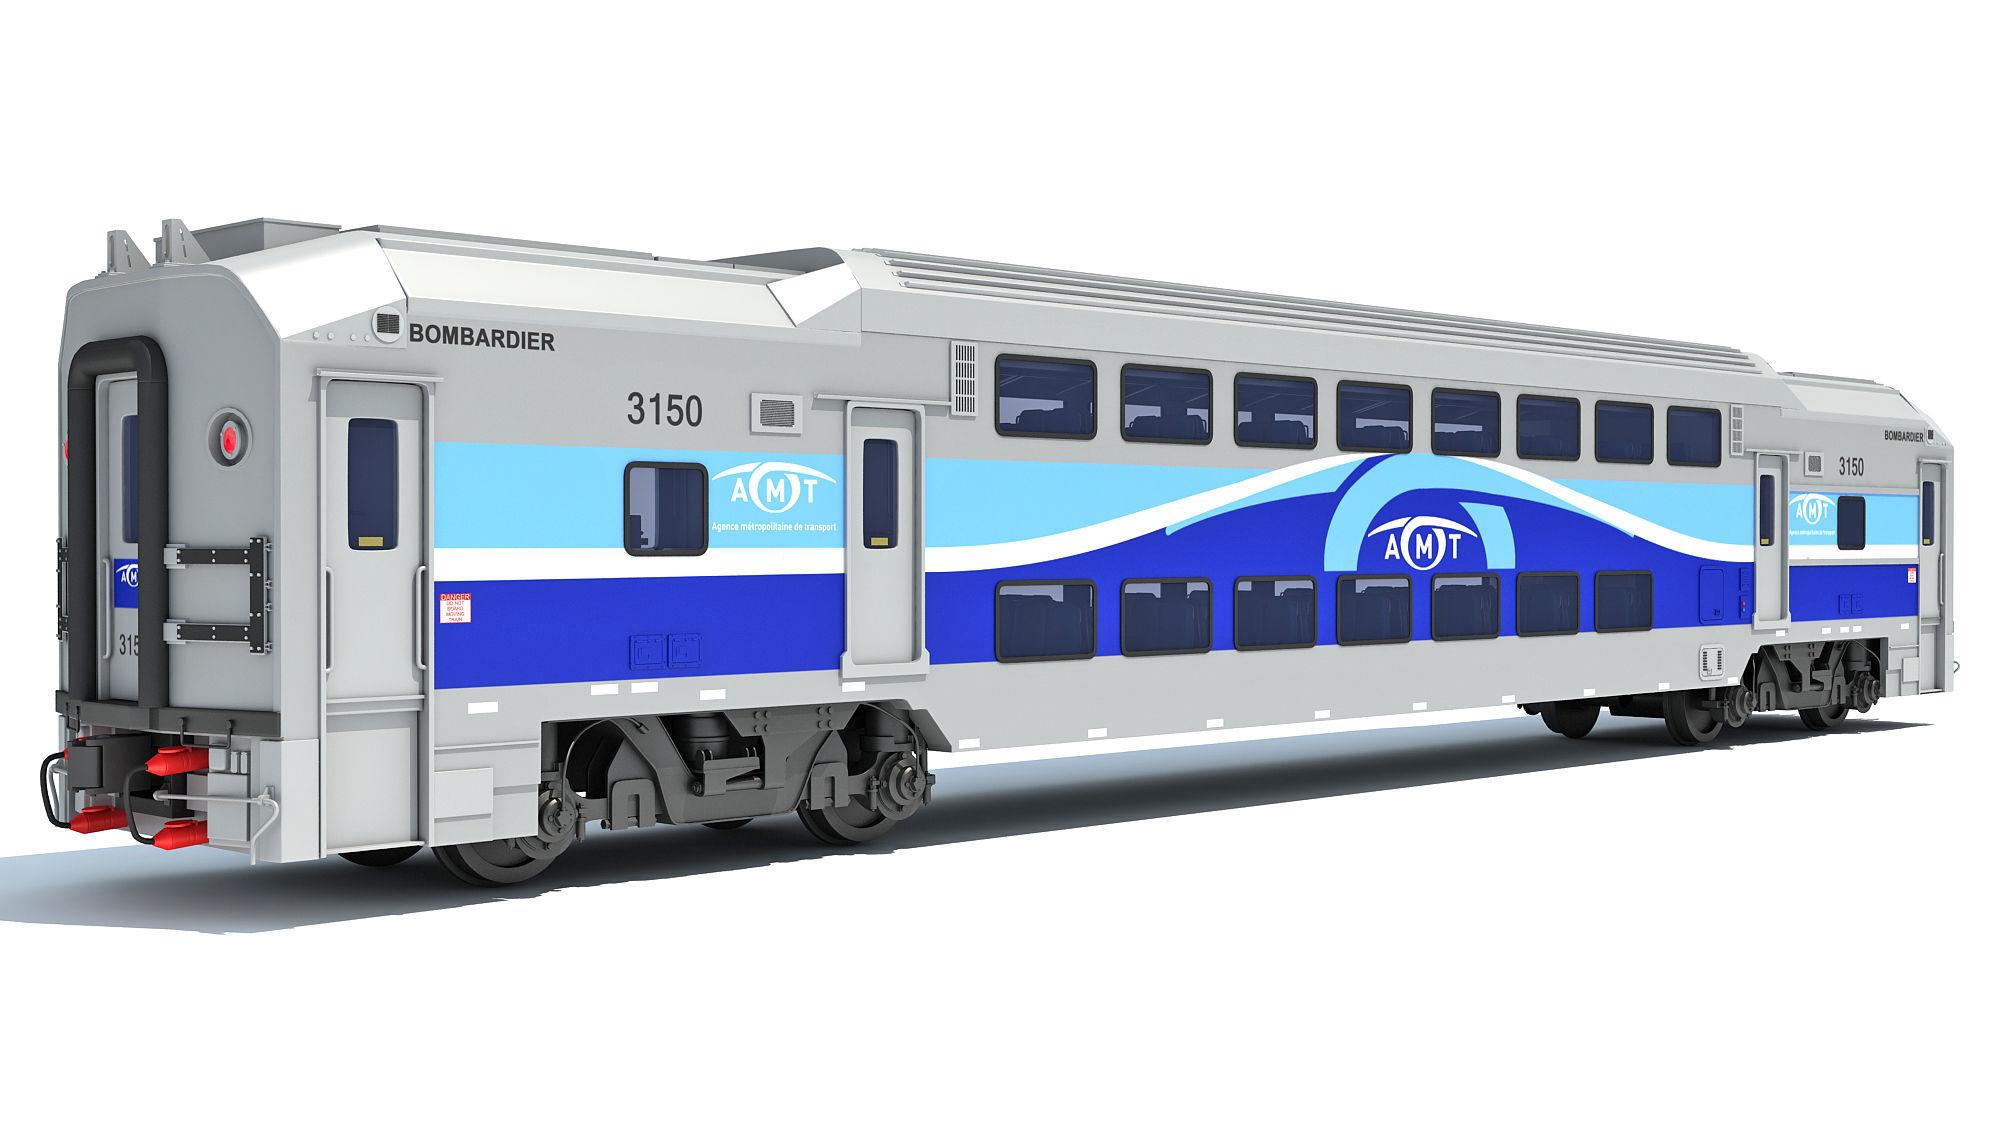 Exo Train Passenger Car